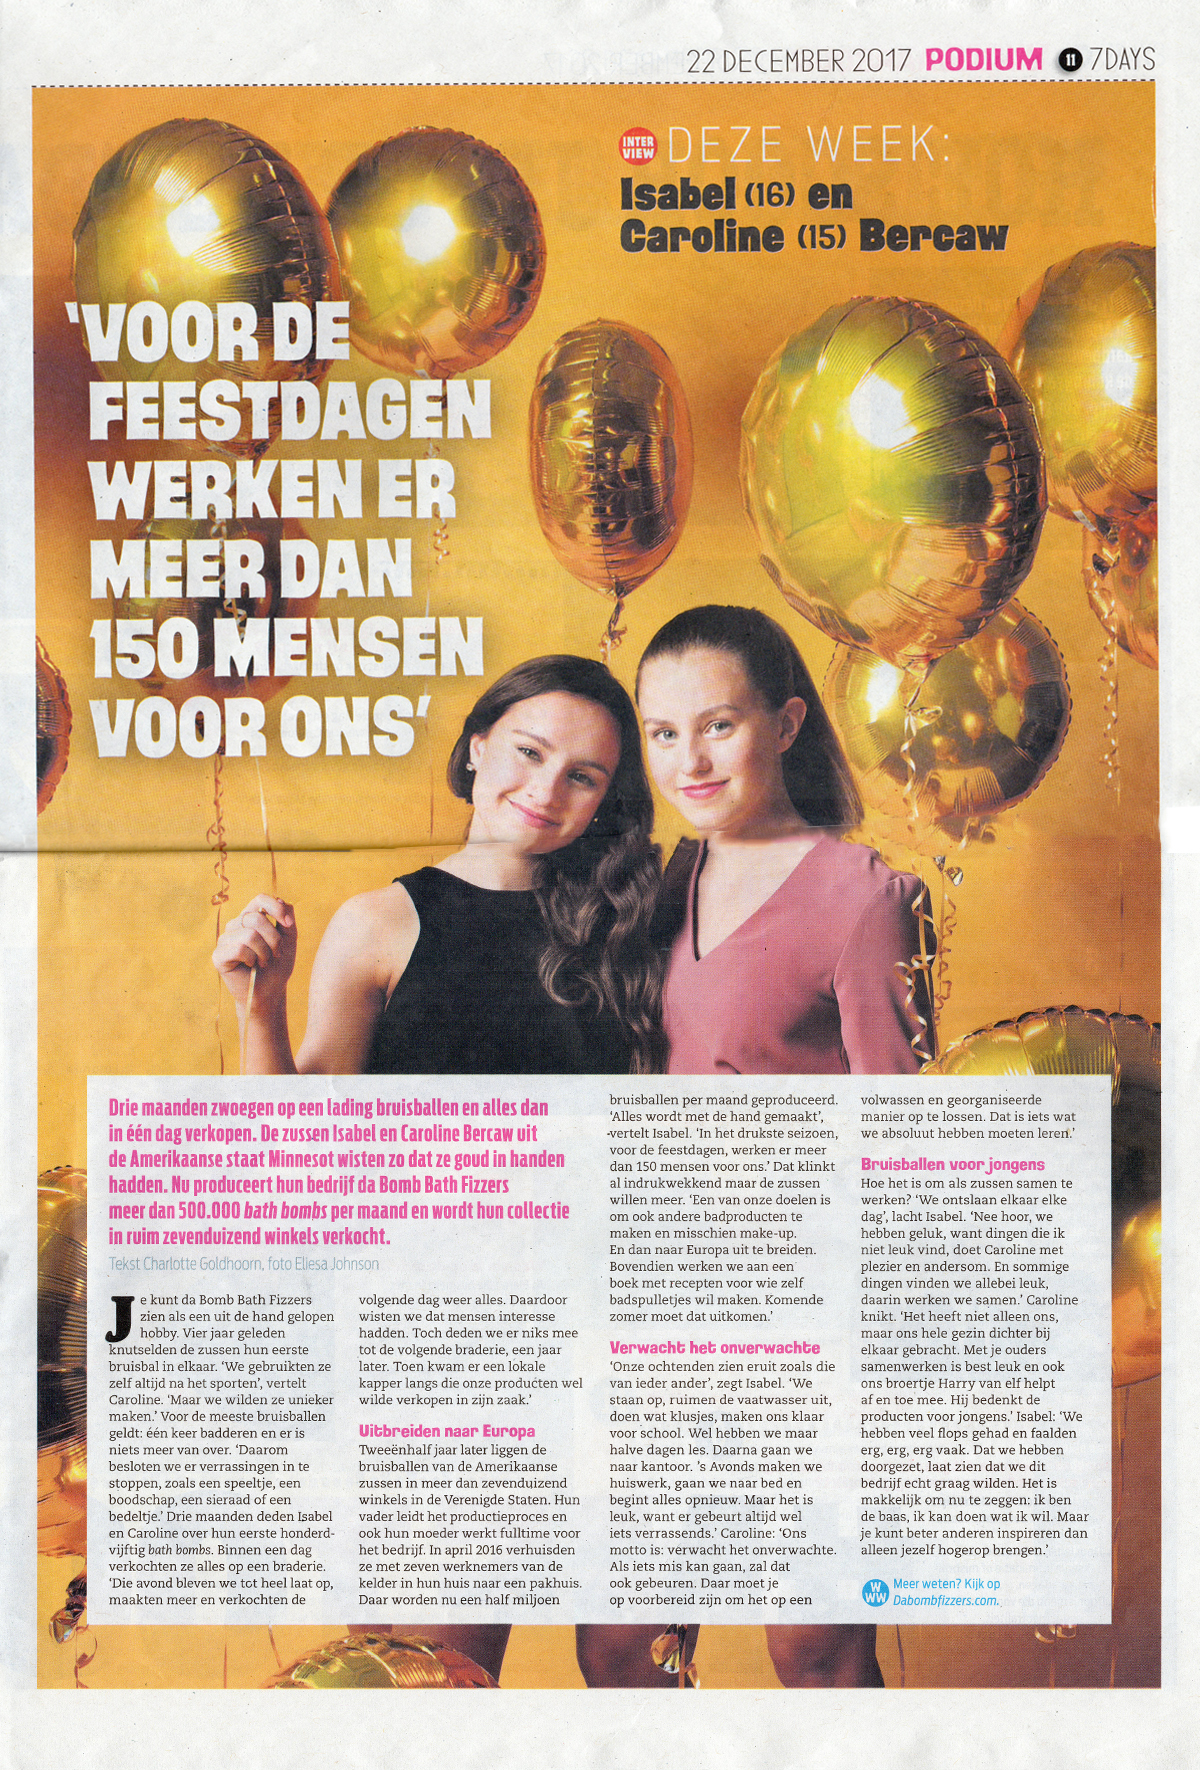 Da Bomb Bath Fizzers sisters Isabel and Caroline Bercaw in dutch newspaper 7 days.